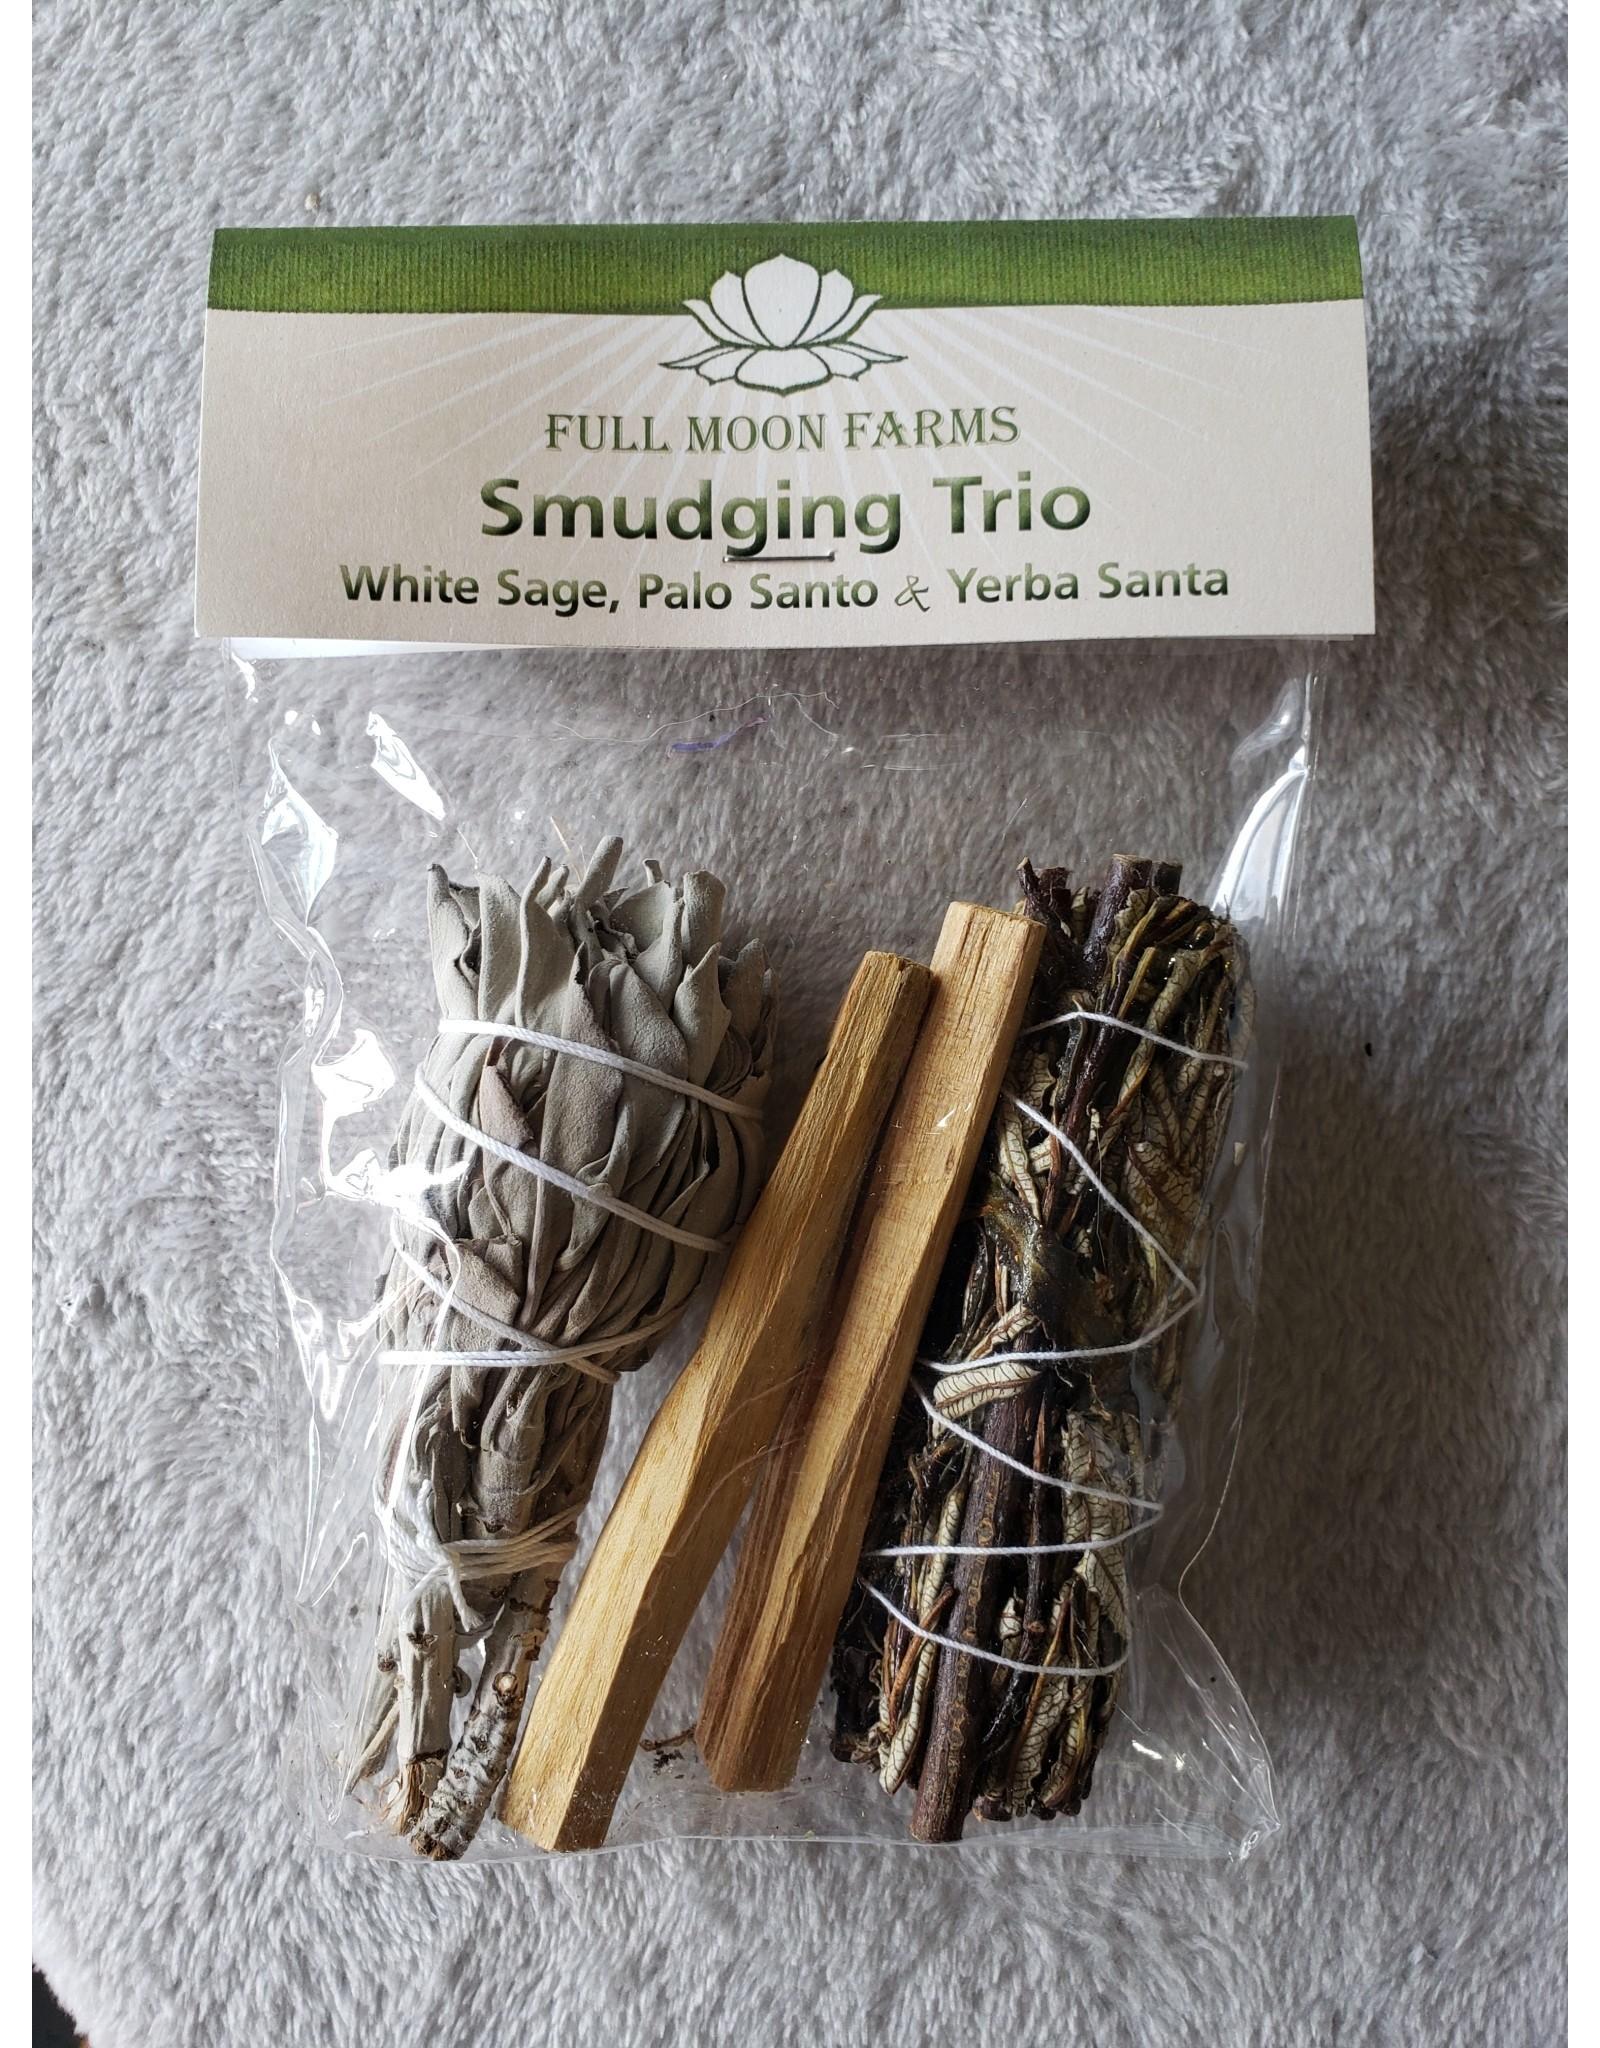 Full Moons Farms Smudging Trio   White Sage, Palo Santo, Yerba Santa